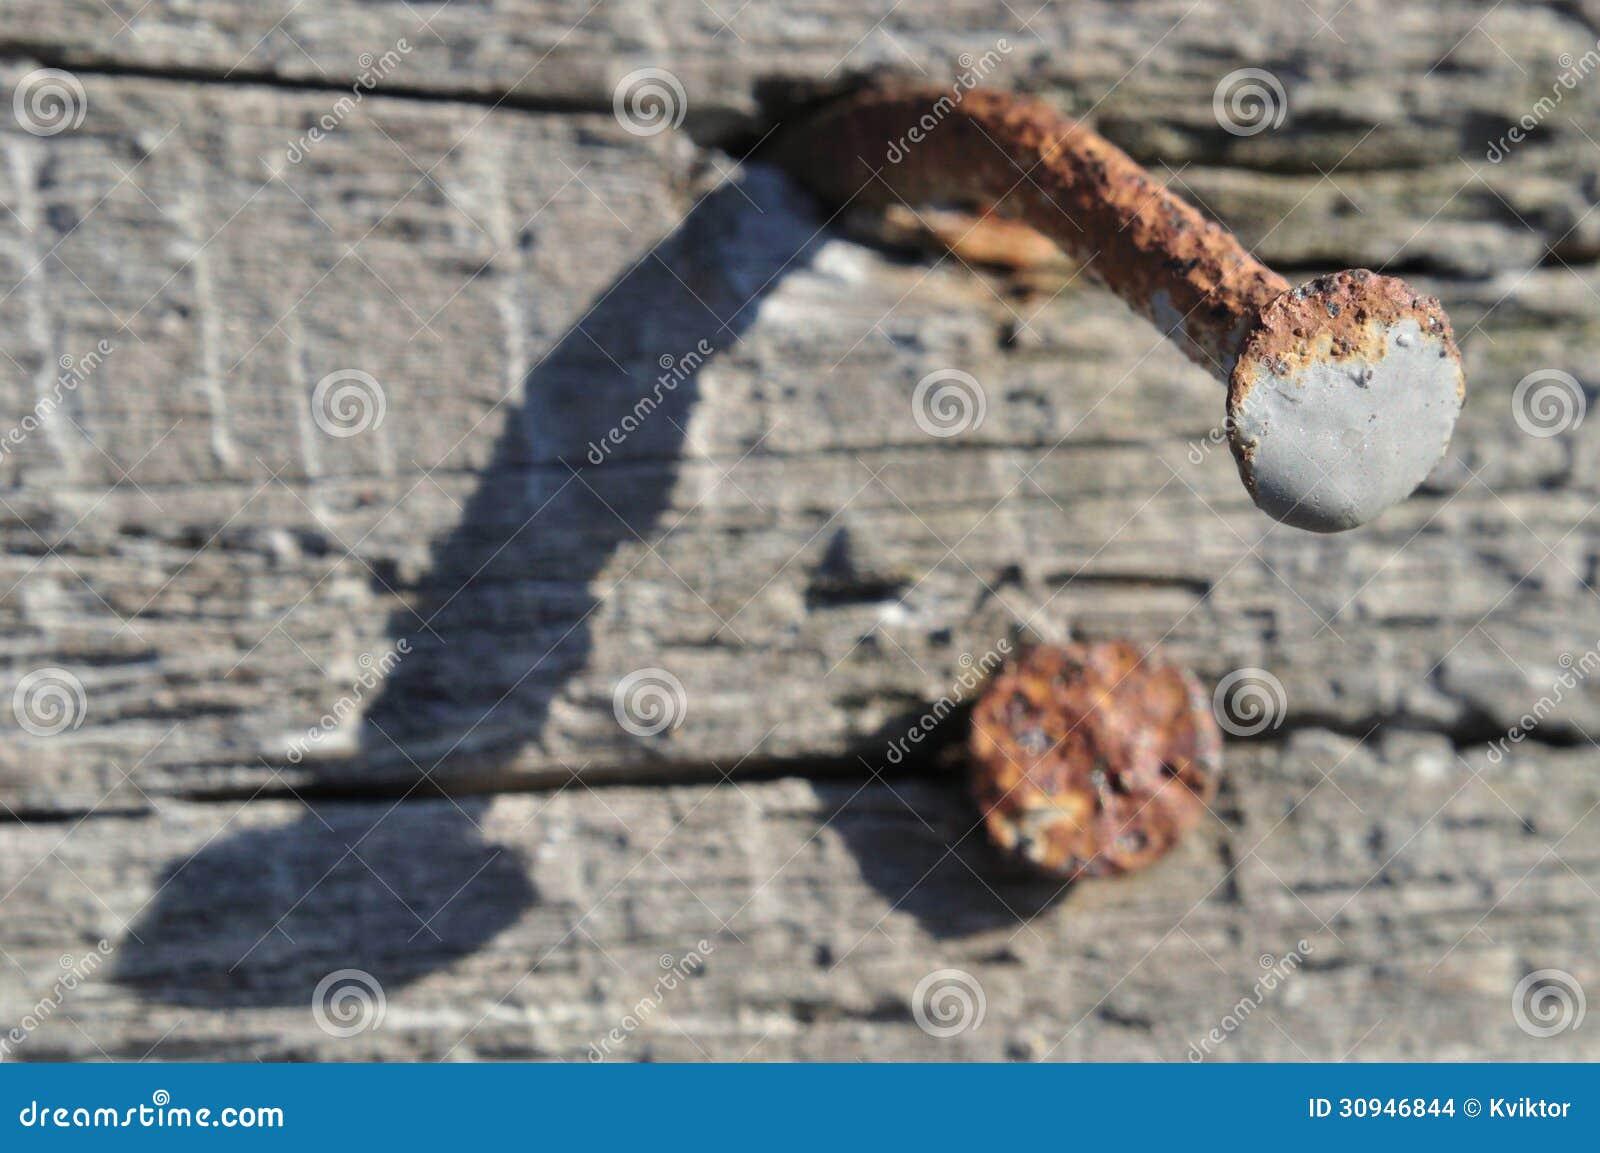 Rostiger Nagel Auf Altem Holz Stockfoto - Bild von gealtert, kopf ...